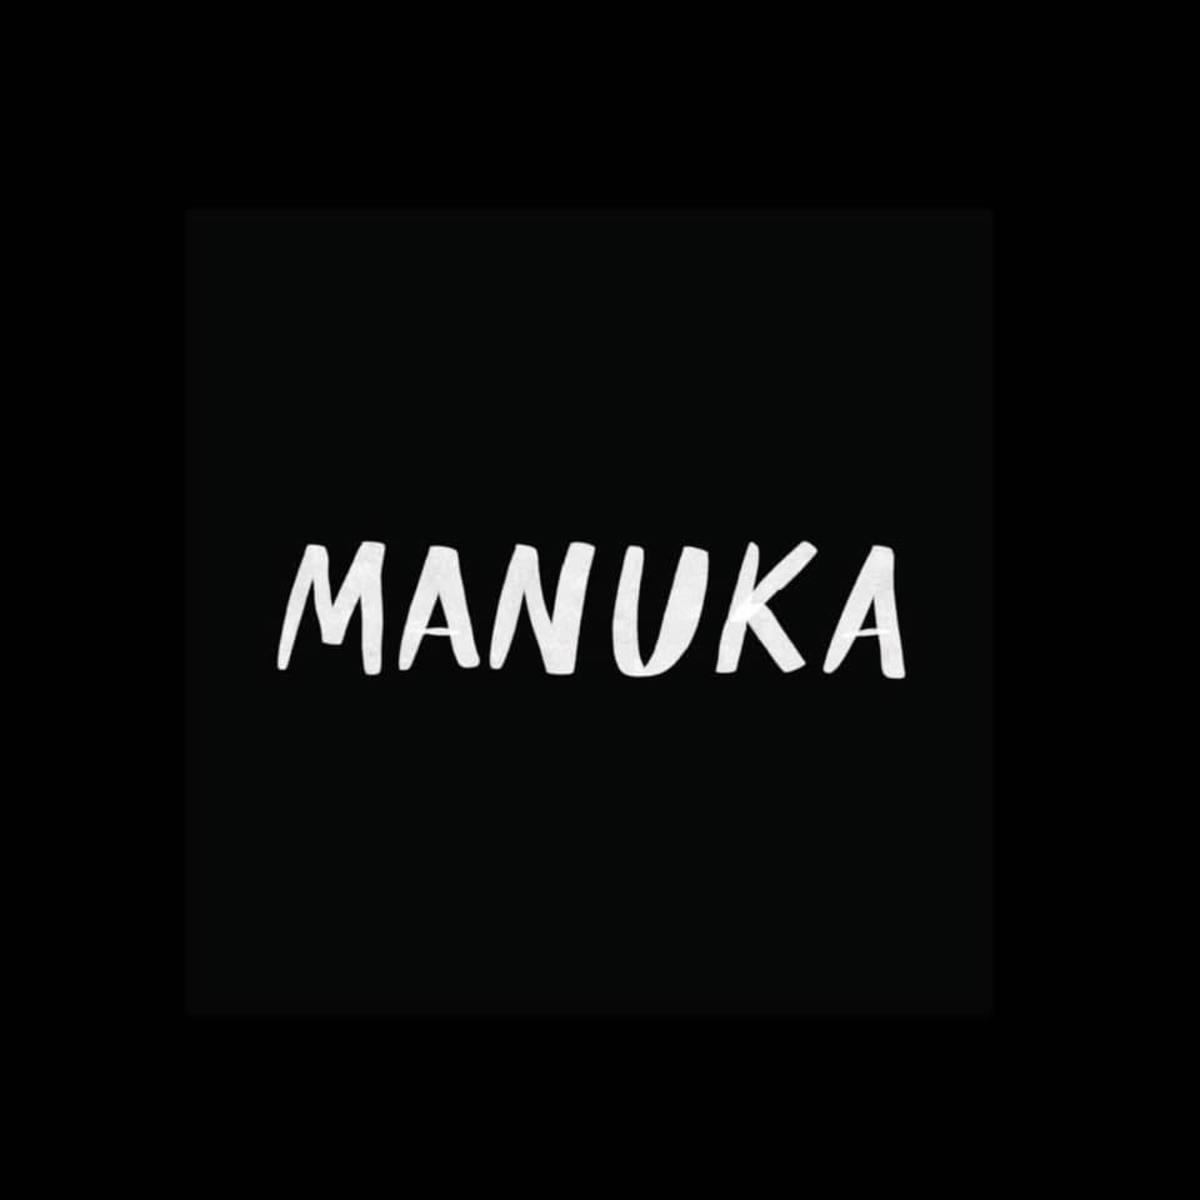 Manuka Recordings